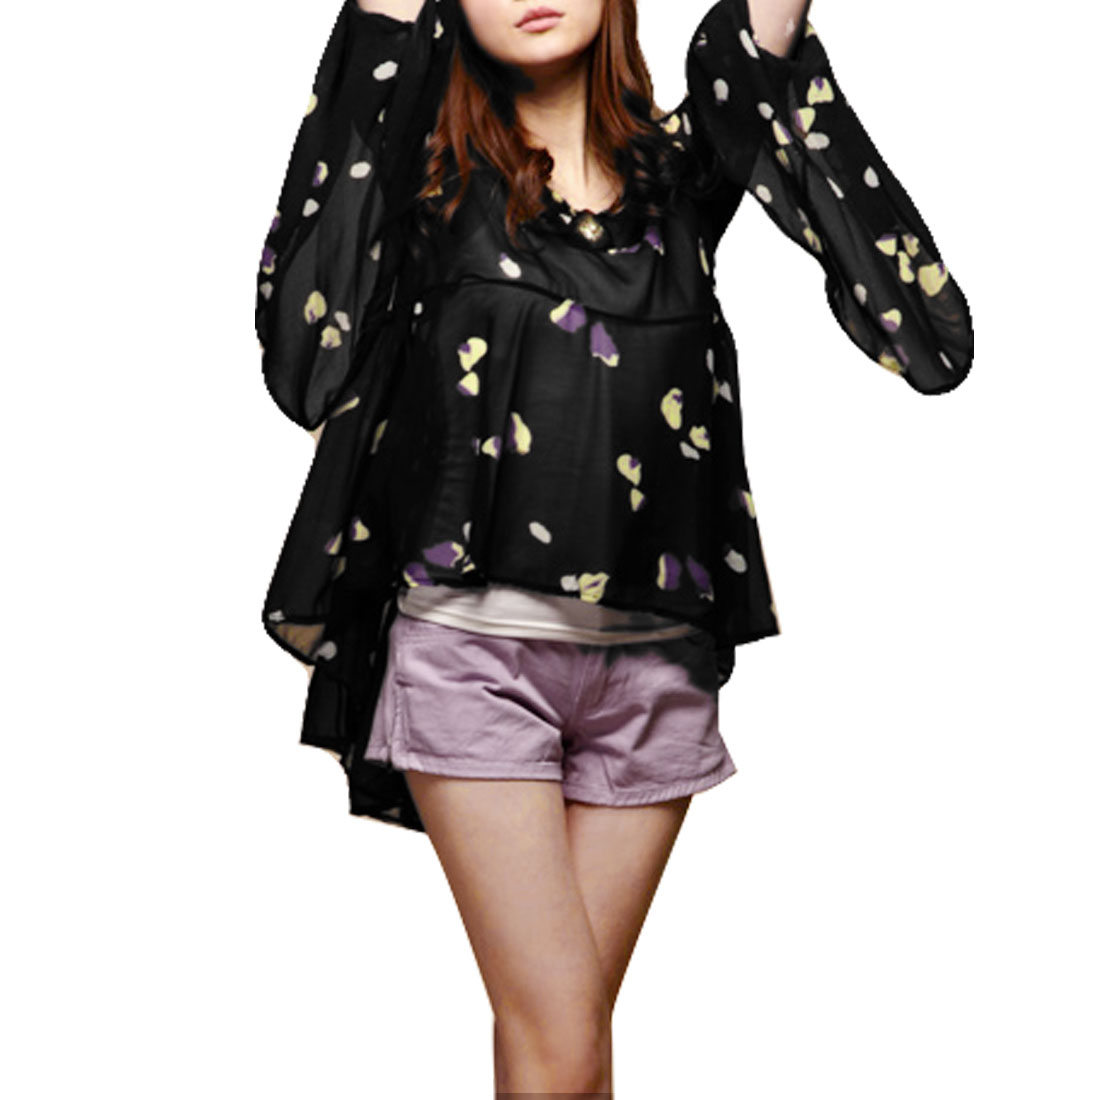 Women Scoop Neck Bell Sleeve Stylish Chiffon Blouse Black XS